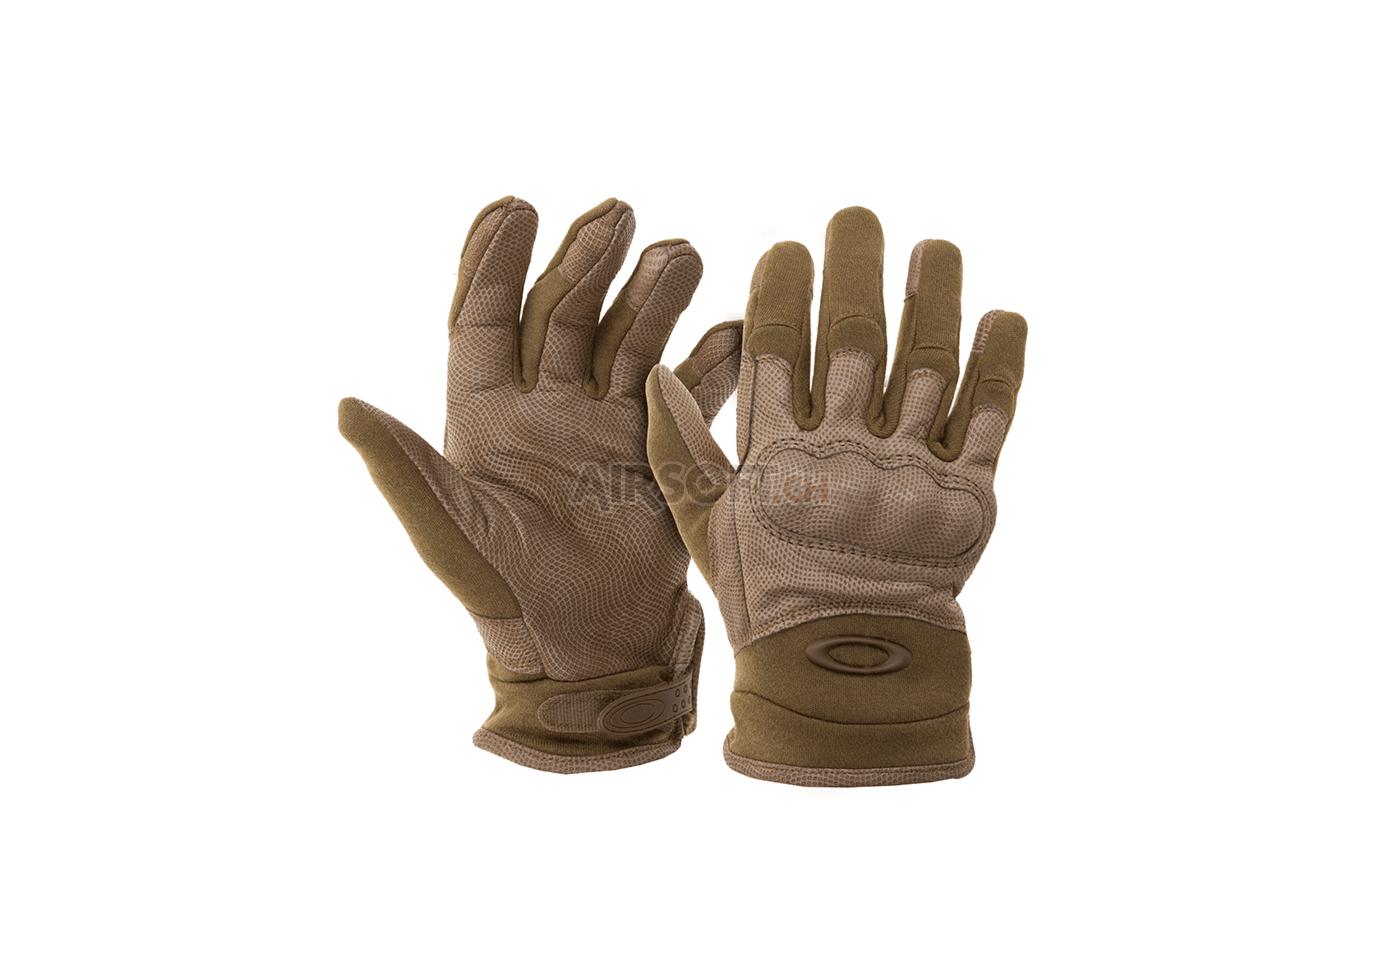 SI Tactical FR Gloves Coyote (Oakley) M - Einsatzhandschuhe ... efd9483ea641